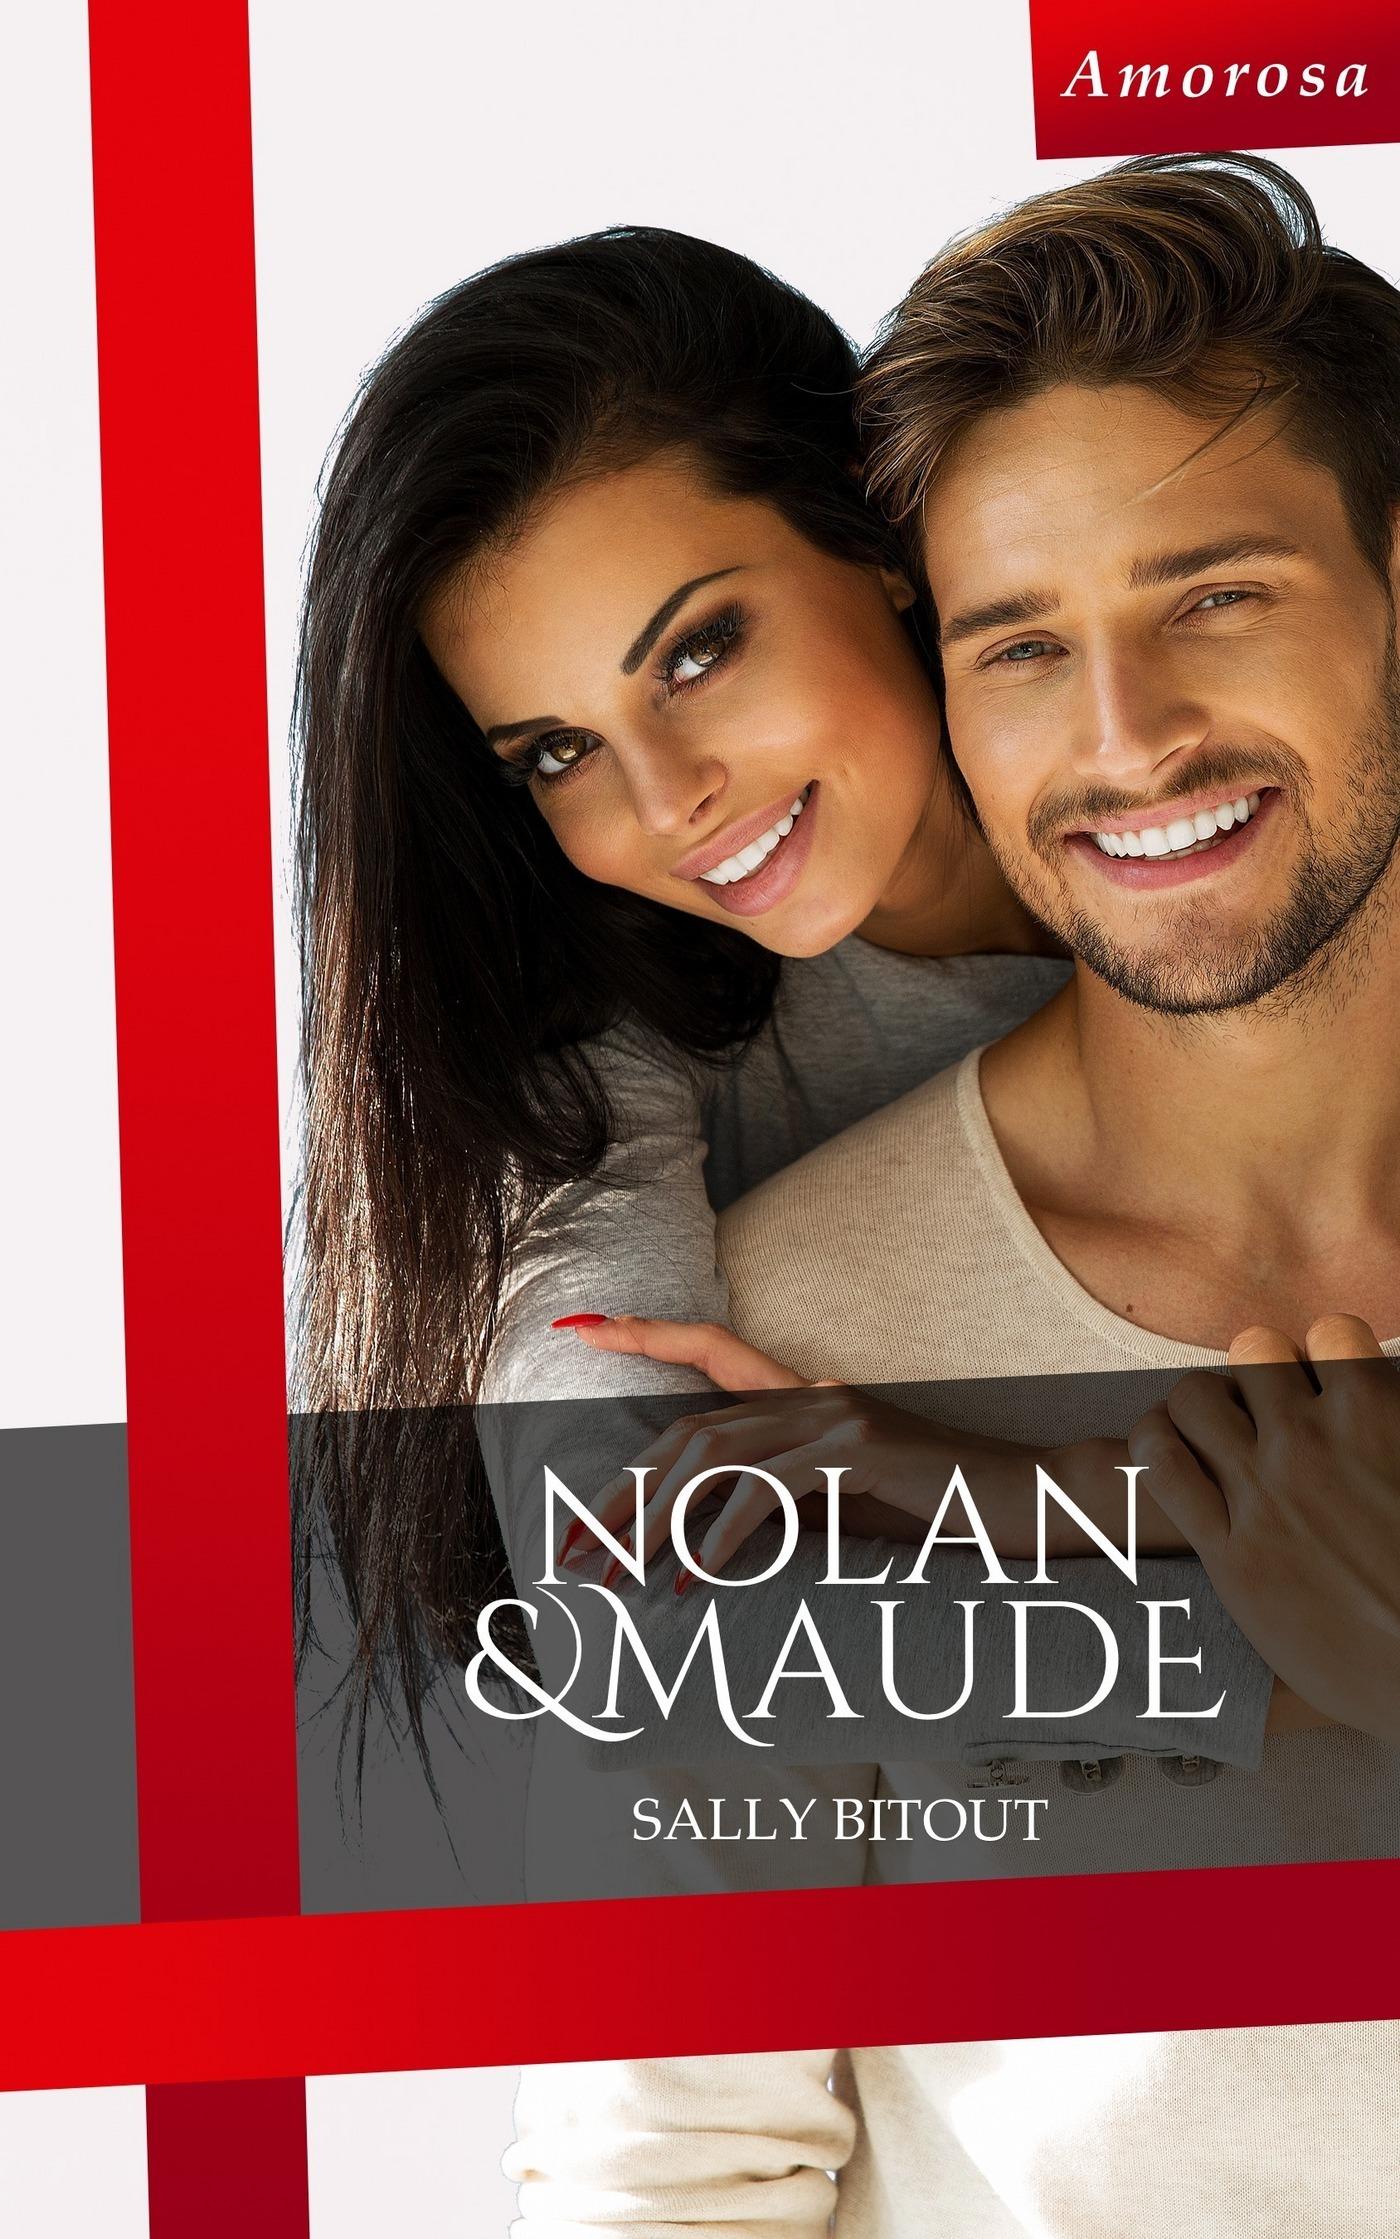 Nolan et Maude